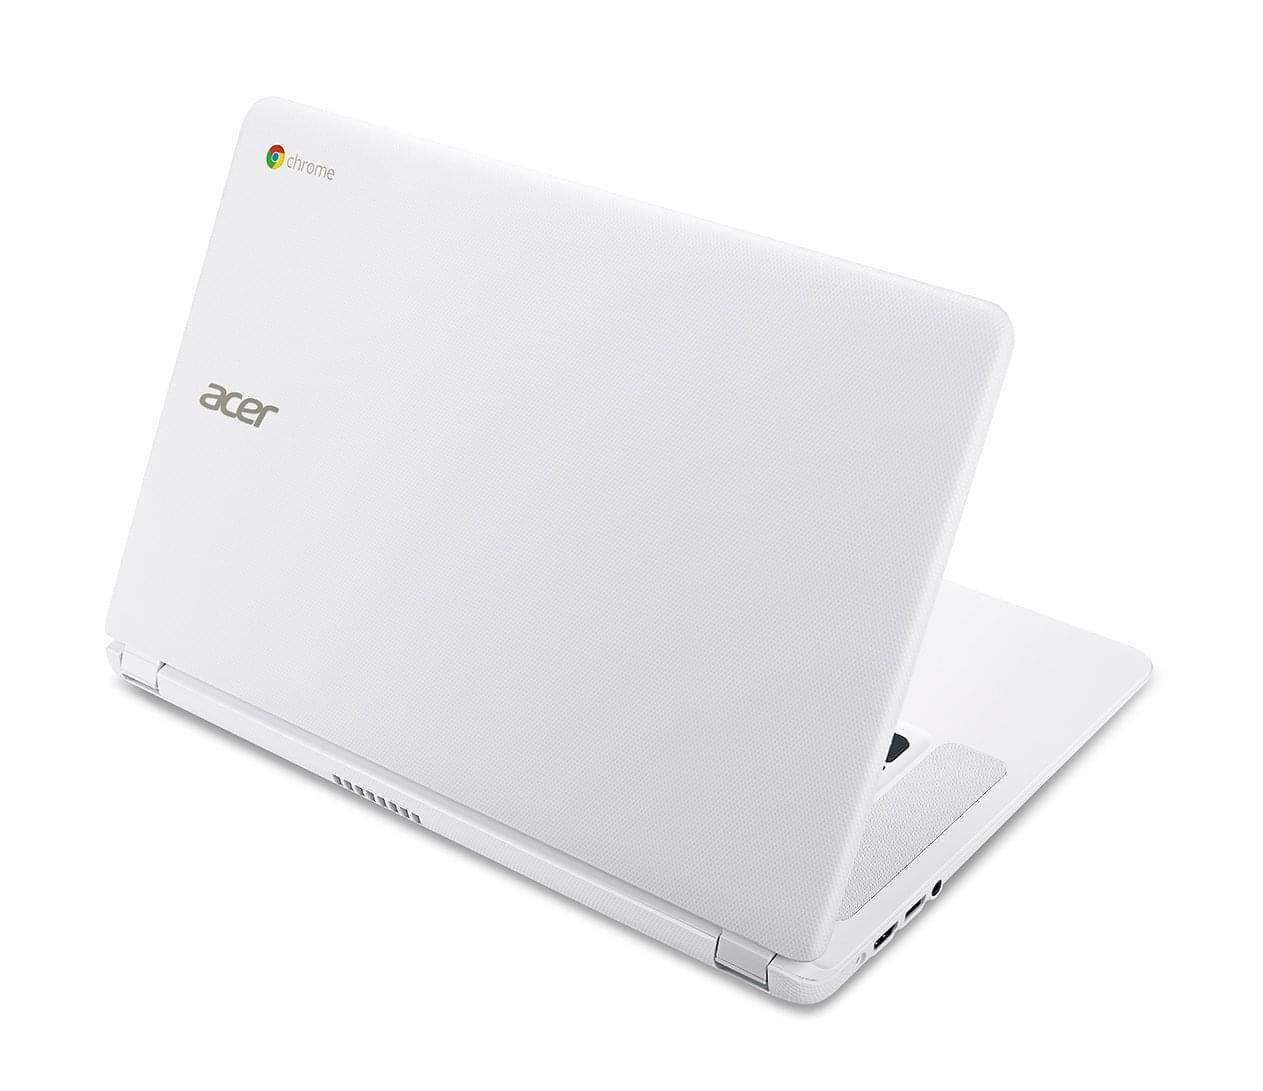 Acer Chromebook 15 CB5 571 362Q 04